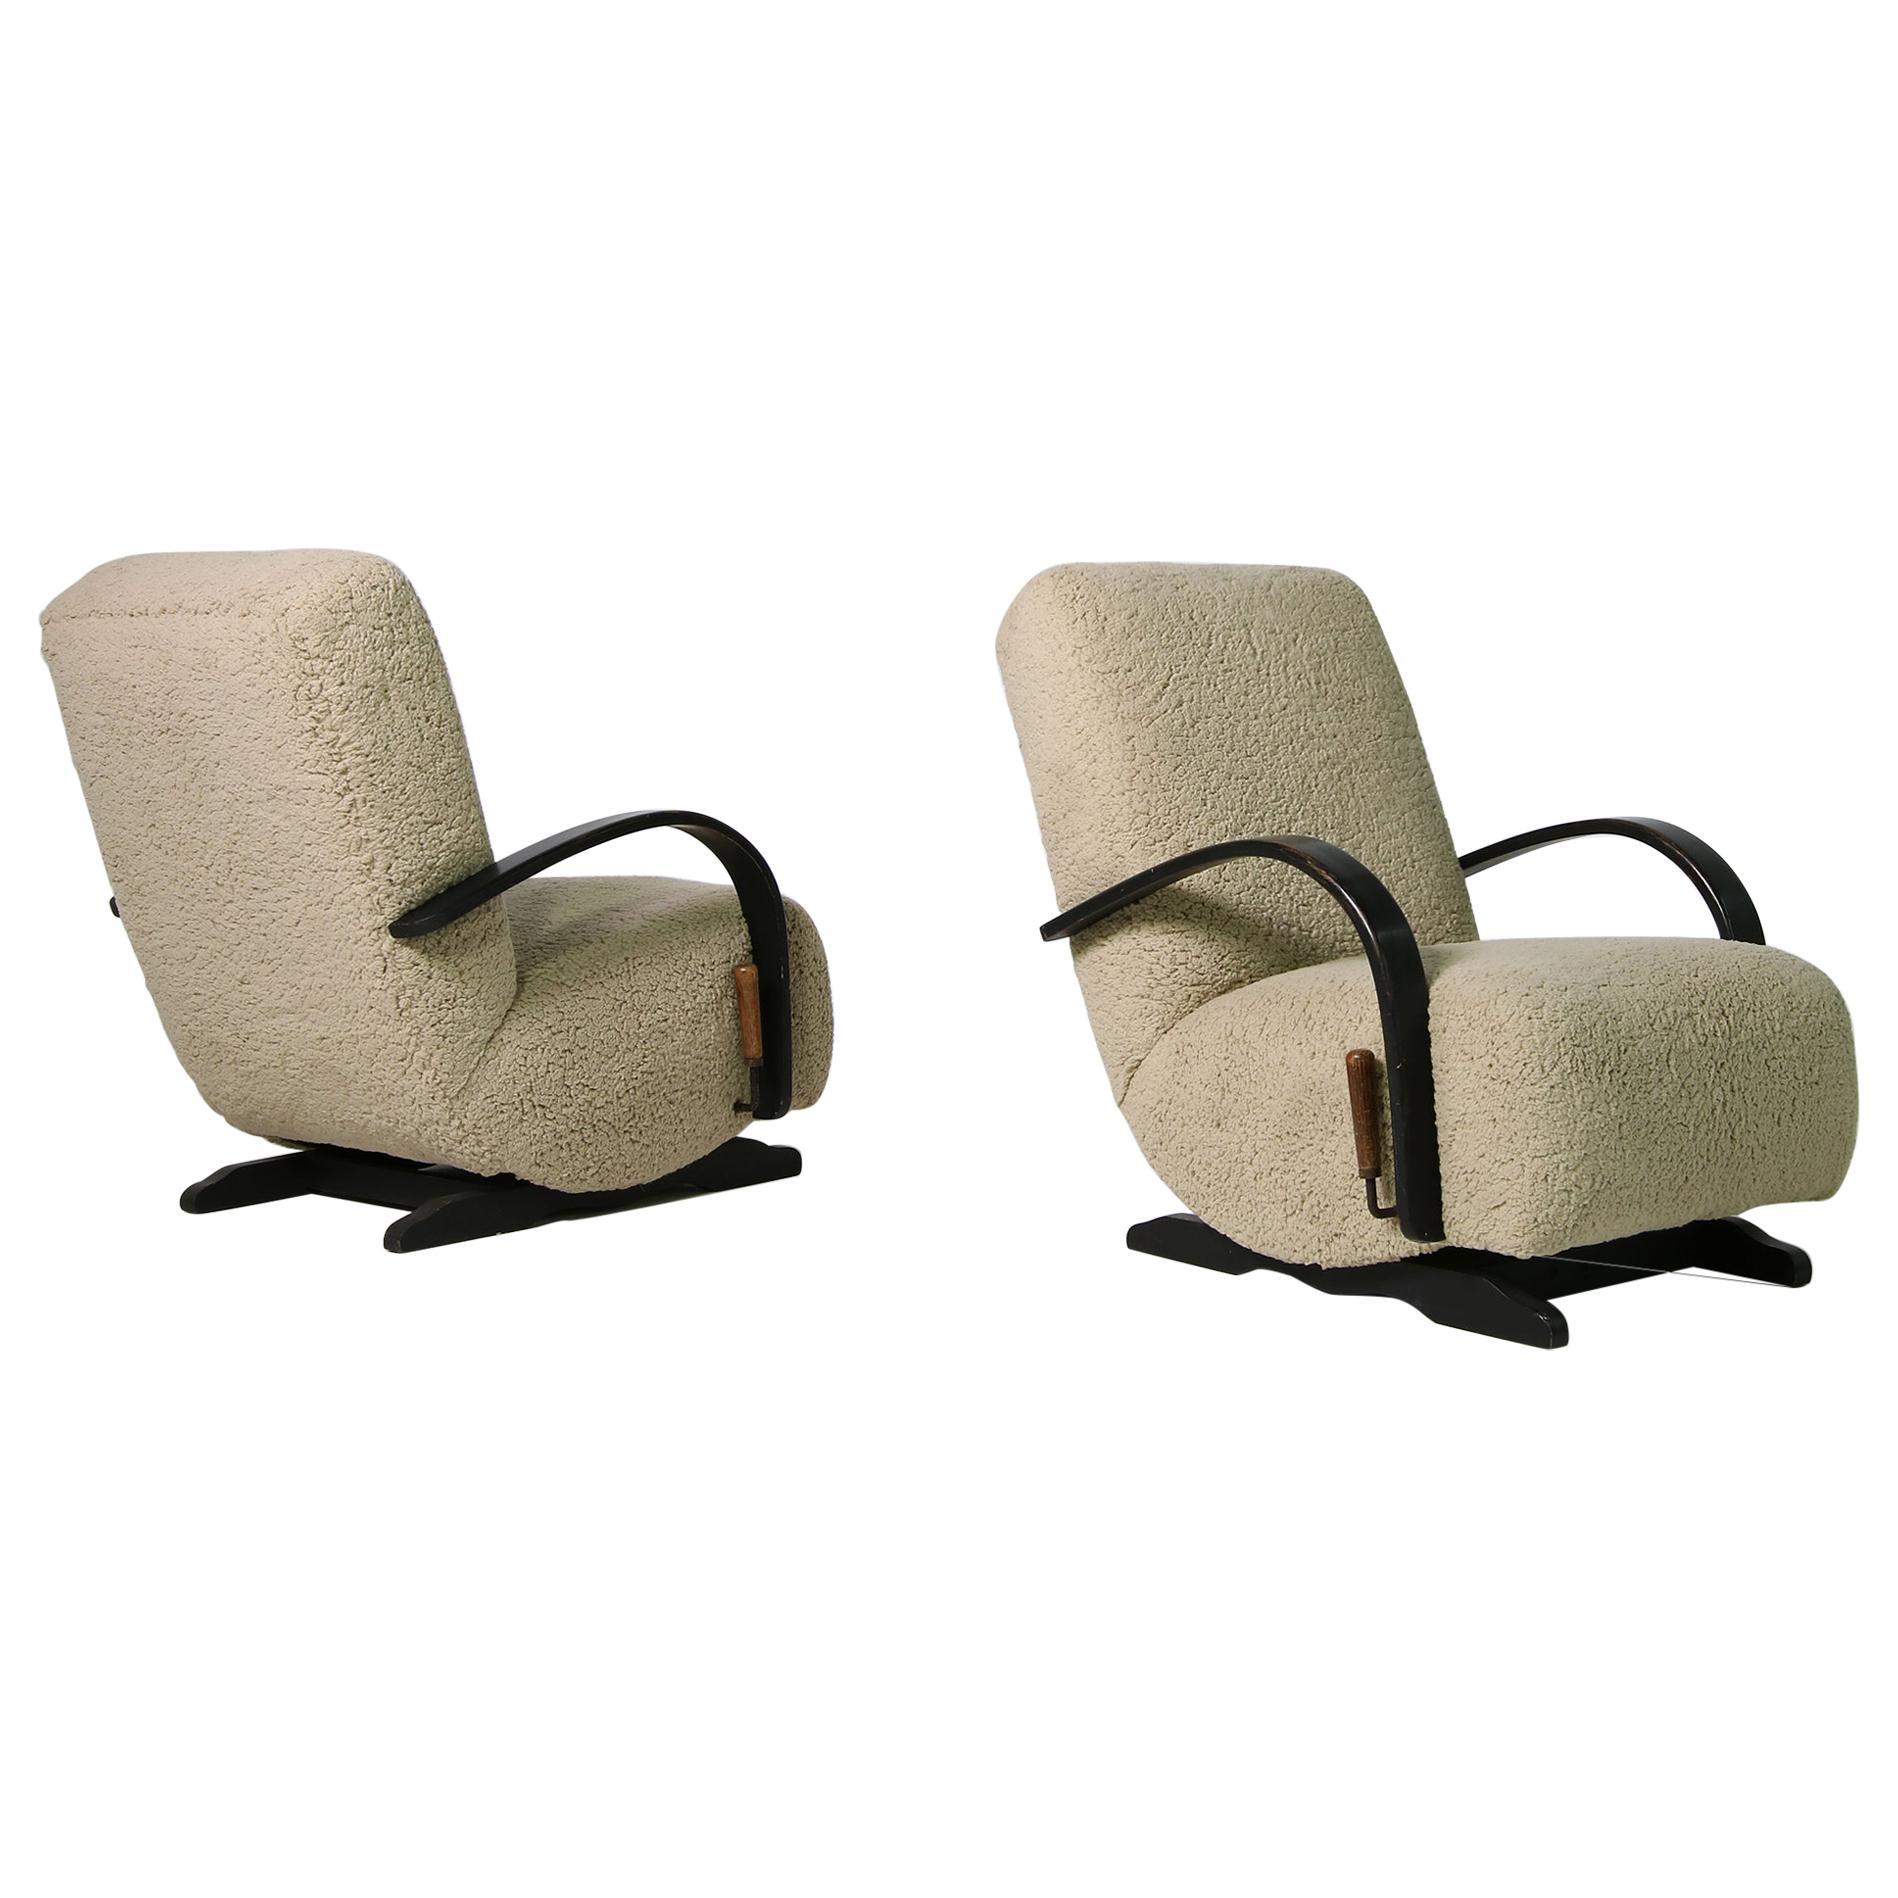 Pair of Rare 1960s Rocking Chairs, Teddy Fur & Leather, Sheepskin, Beech & Pine